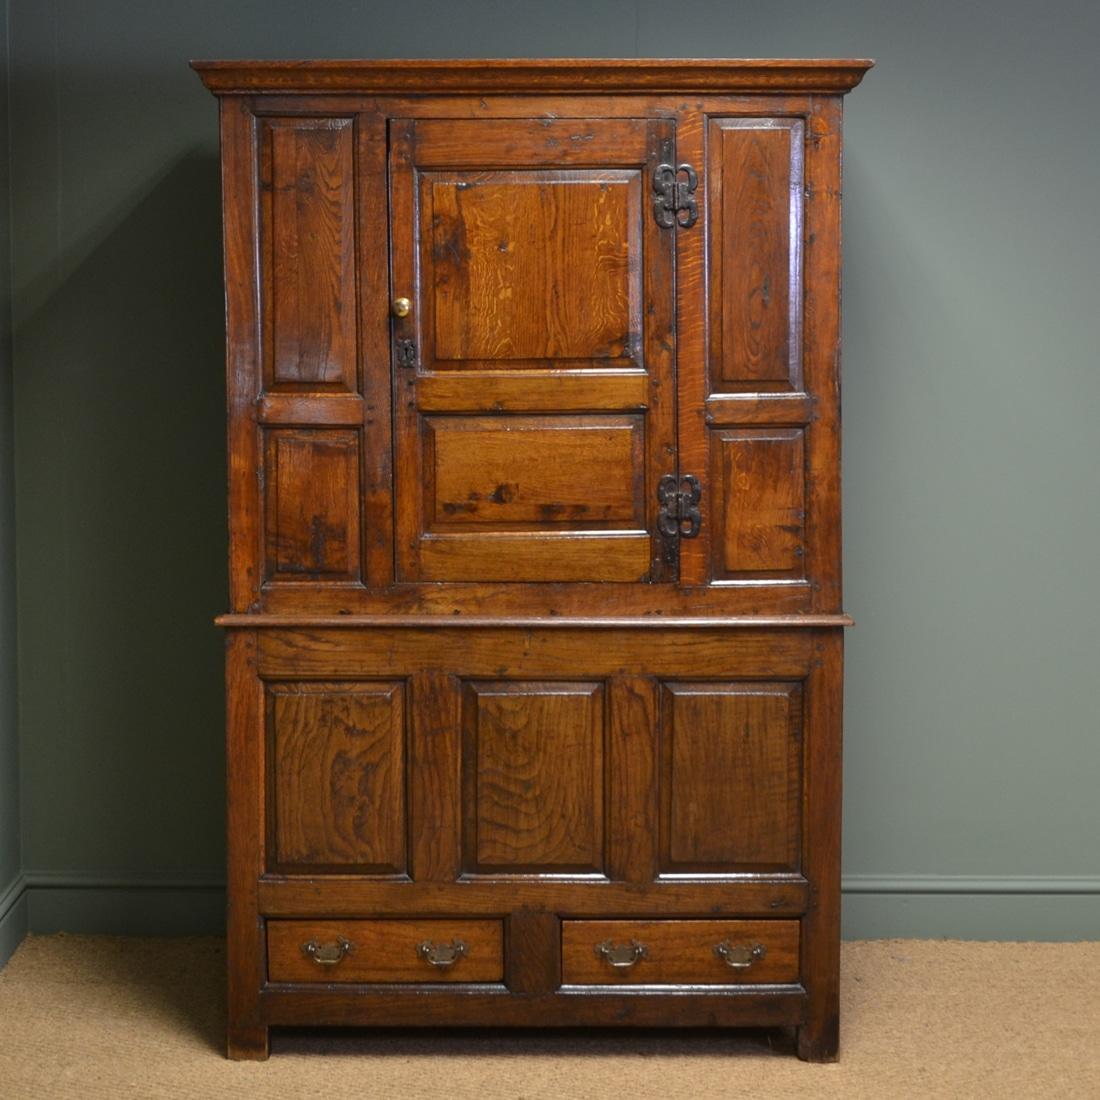 Antique Furniture: Early Eighteenth Century Period Oak Antique Harness